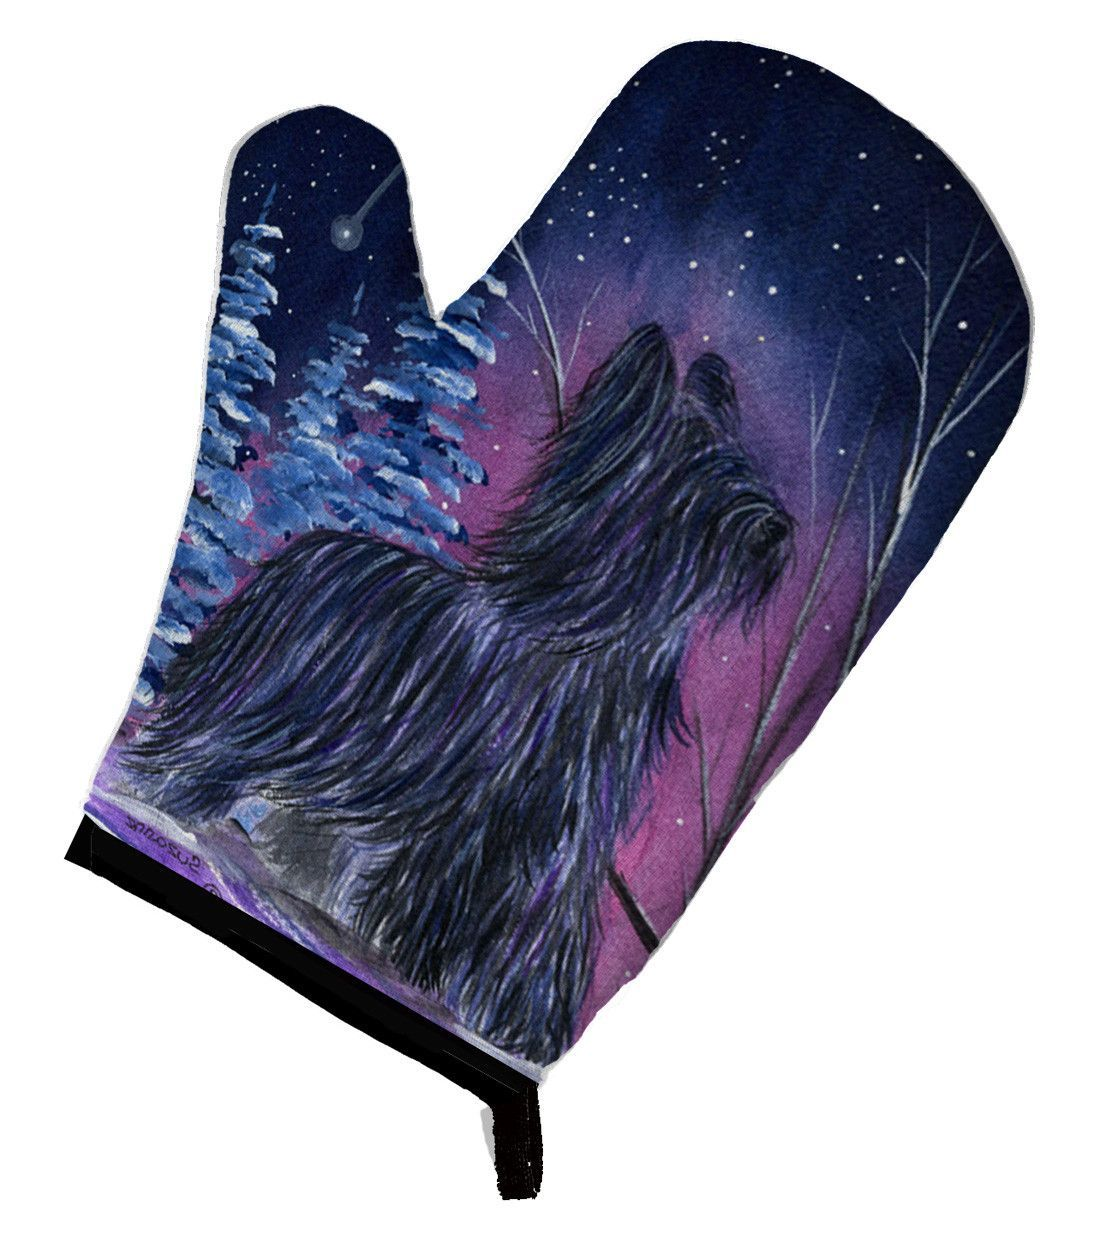 Starry Night Briard Oven Mitt